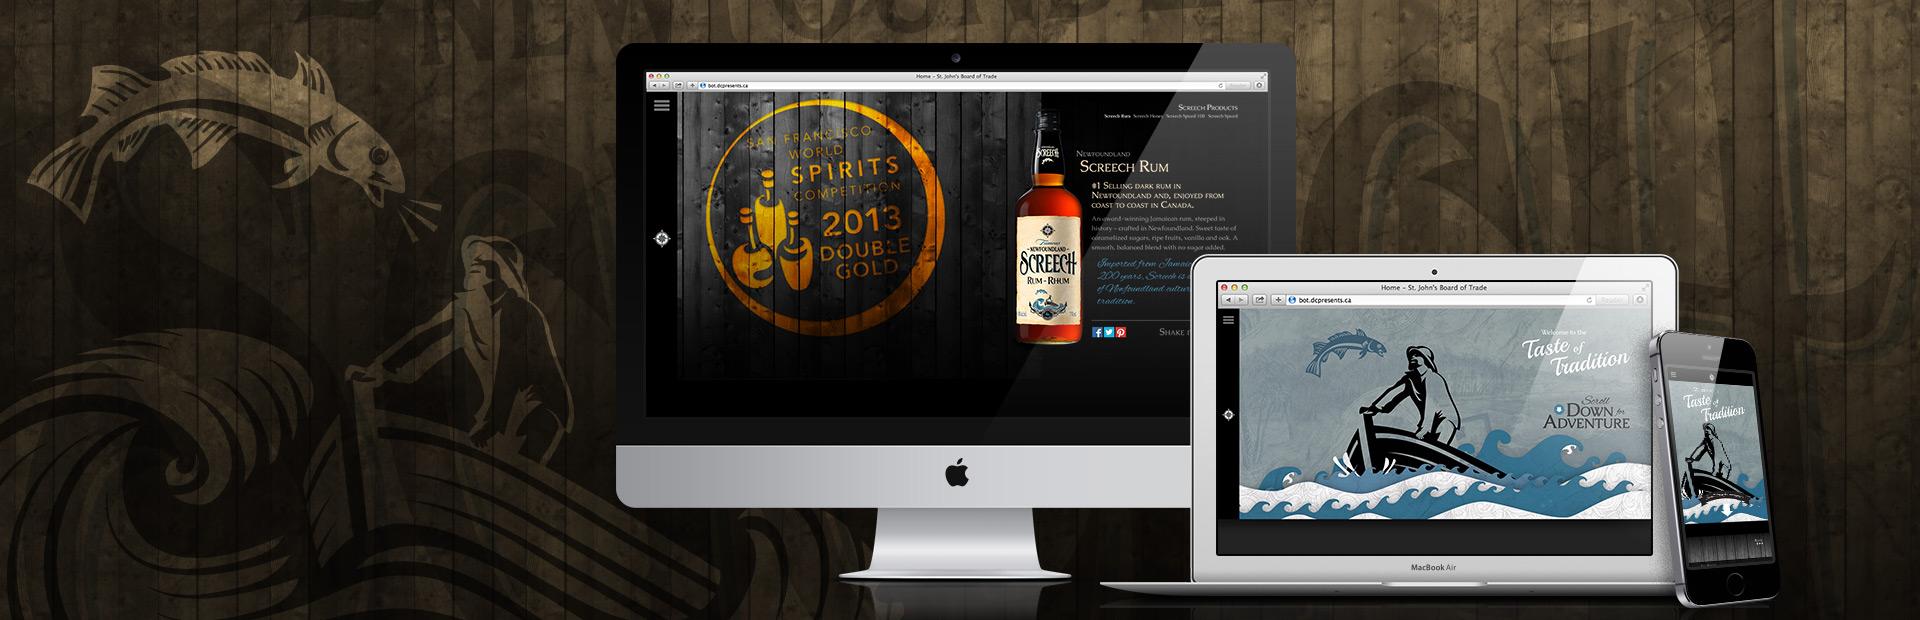 Screech Rum Website Redesign